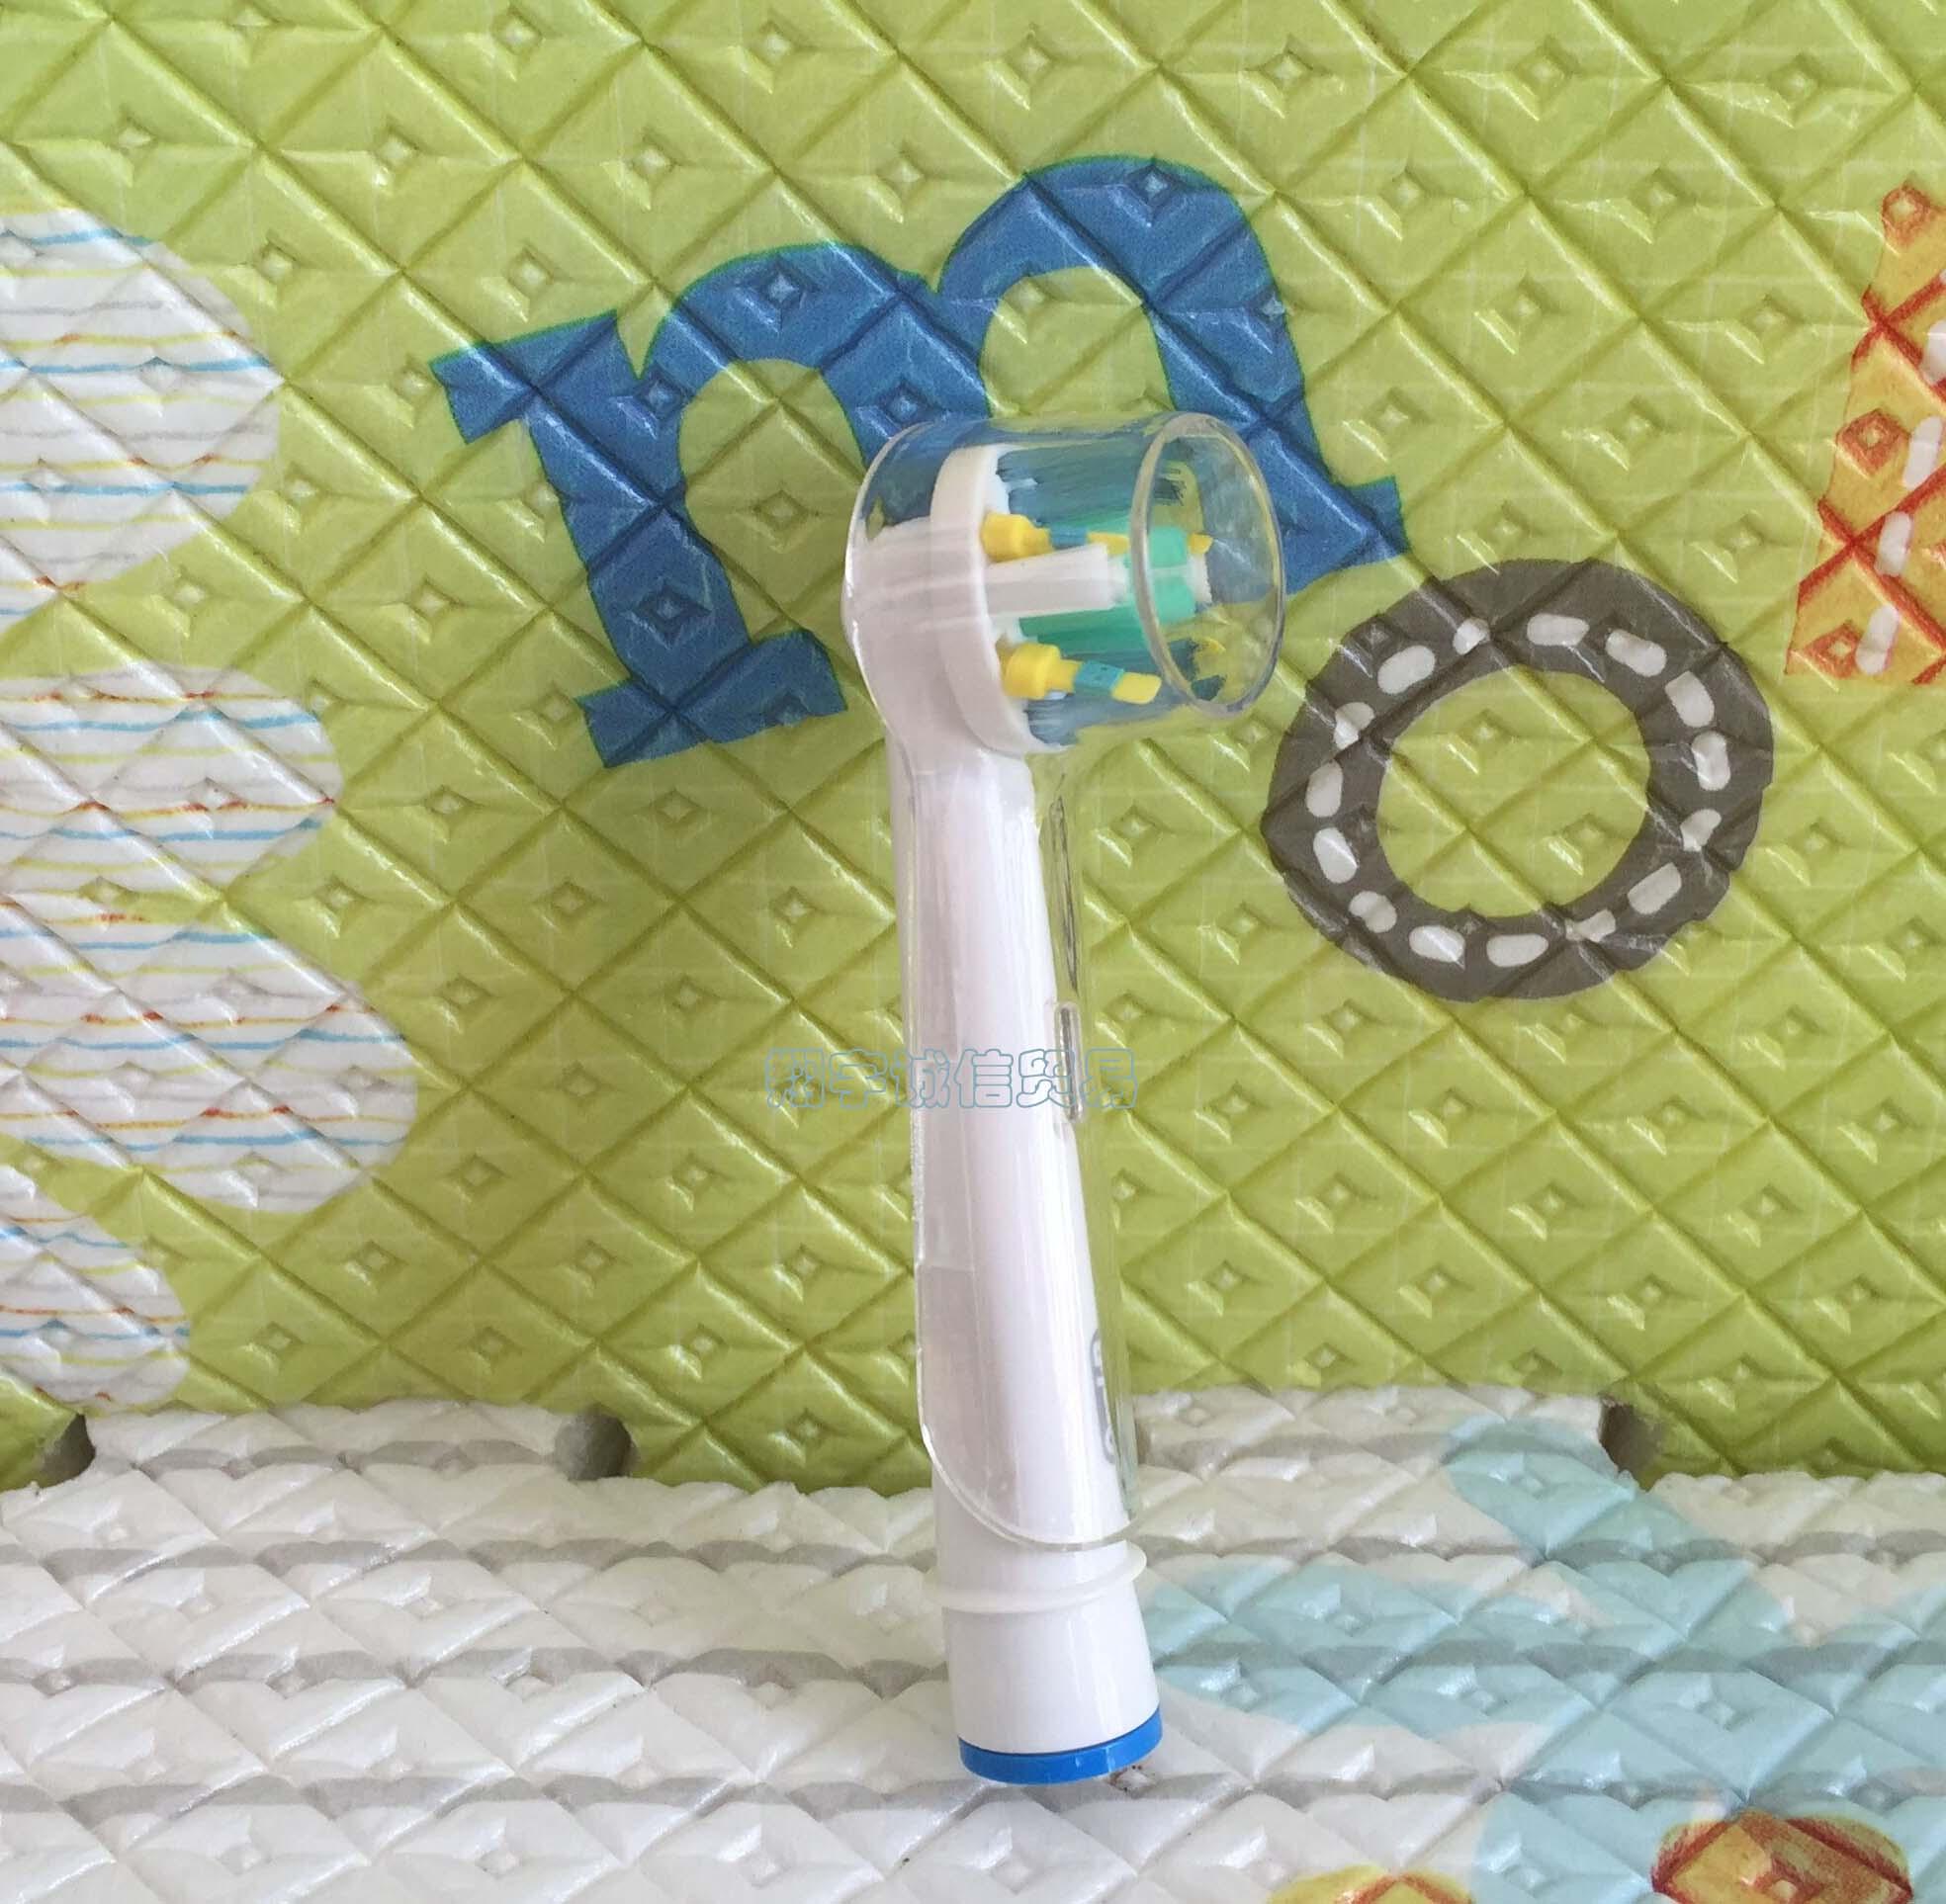 D12 D4 D16 D20 D34 подожди электрический зубная щетка против суперобложка защита крышка